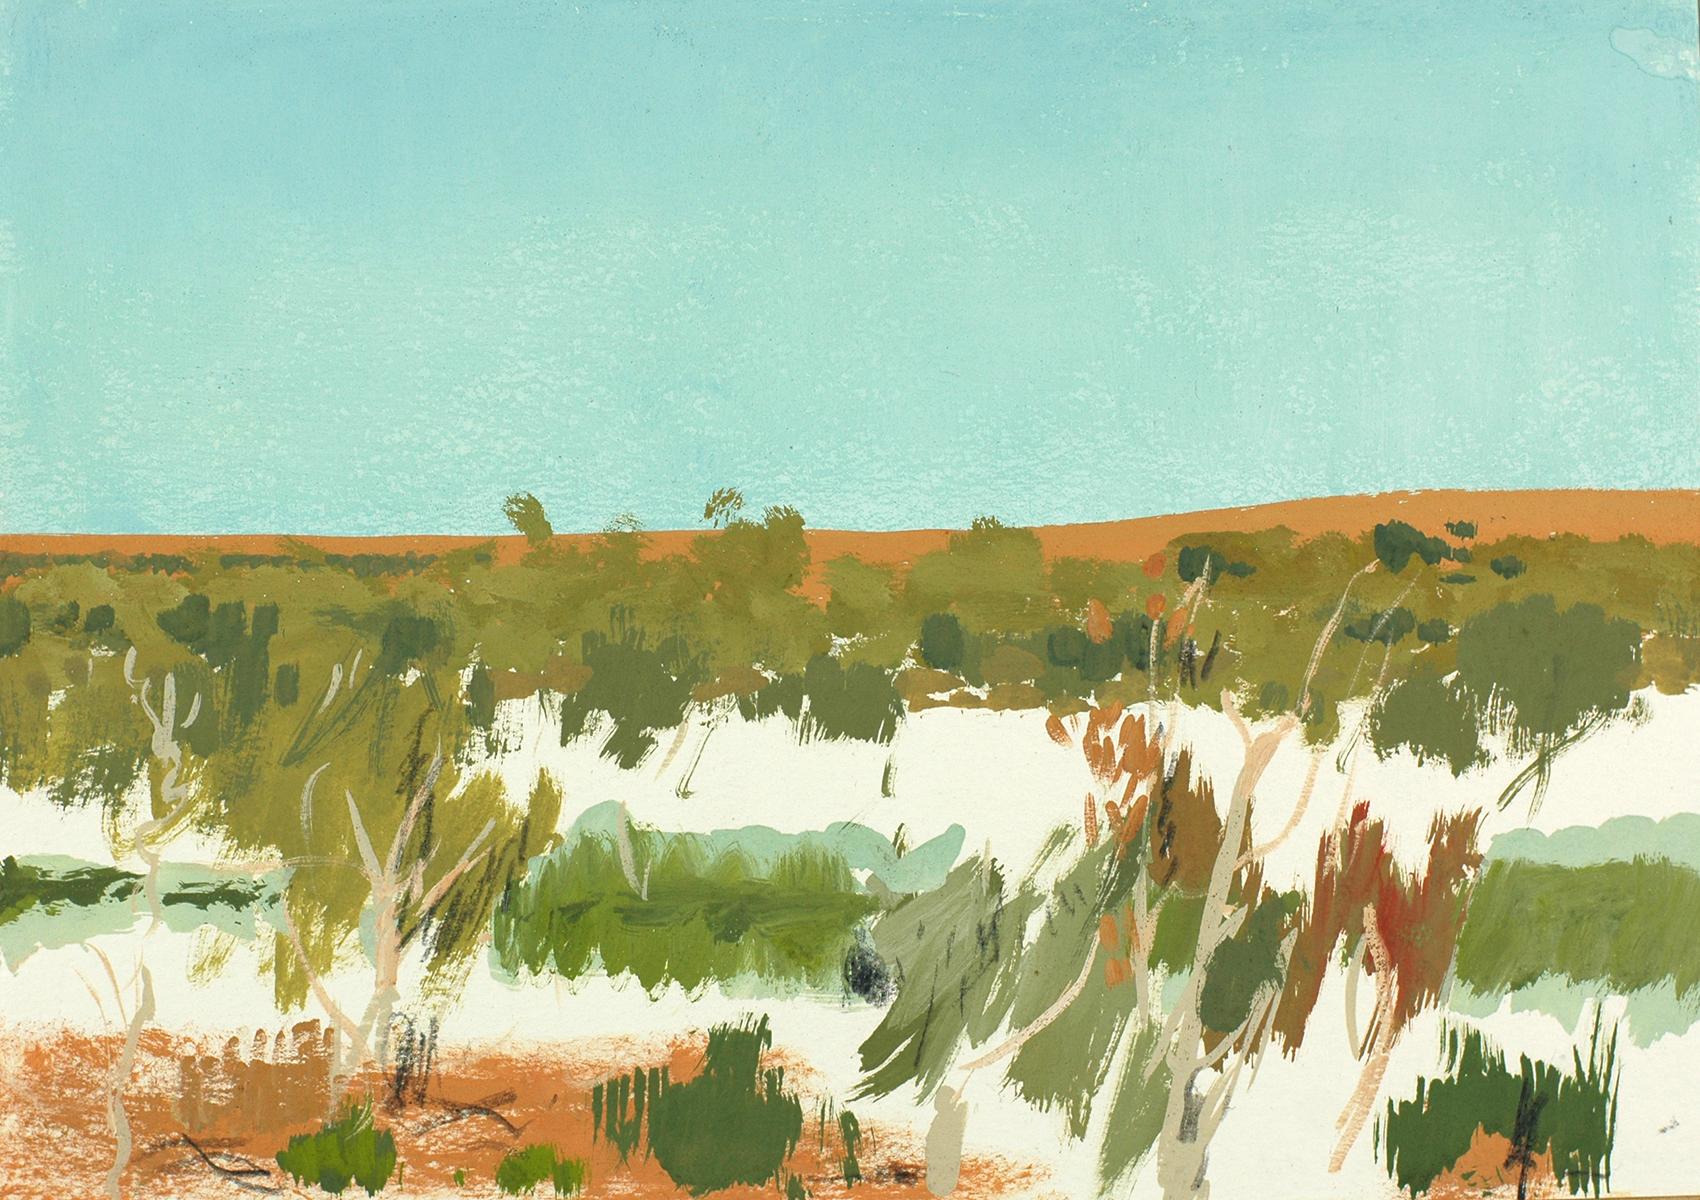 Simpson Desert 13 2009